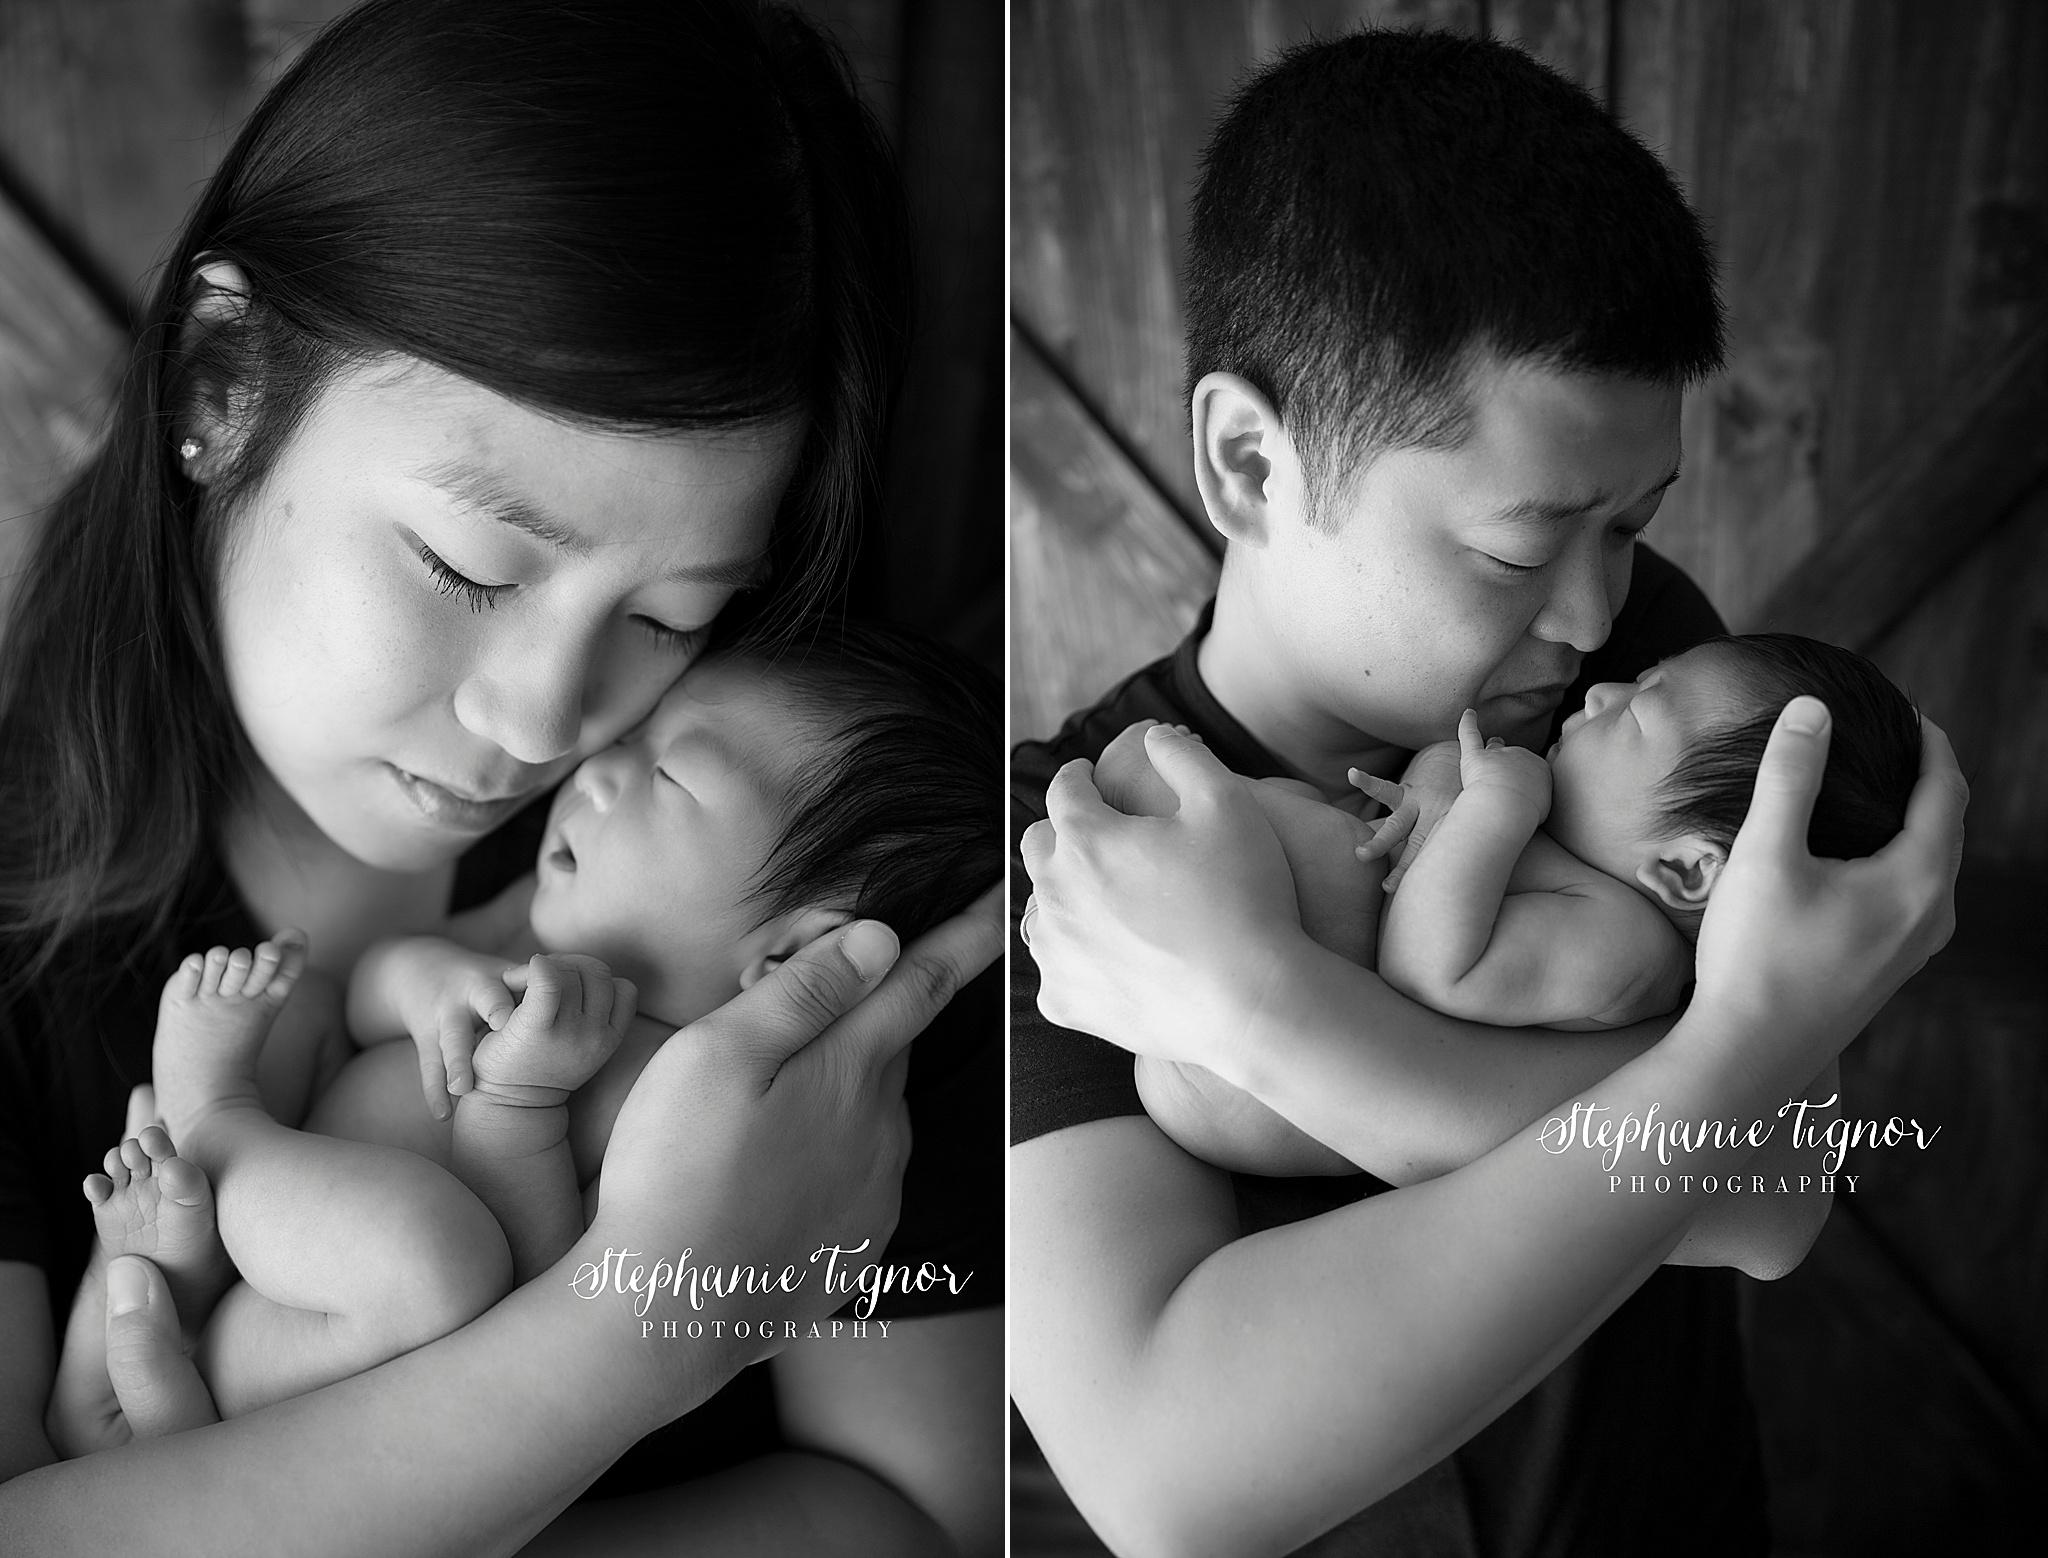 Stephanie Tignor Photography_Newborn Photographer_0079.jpg